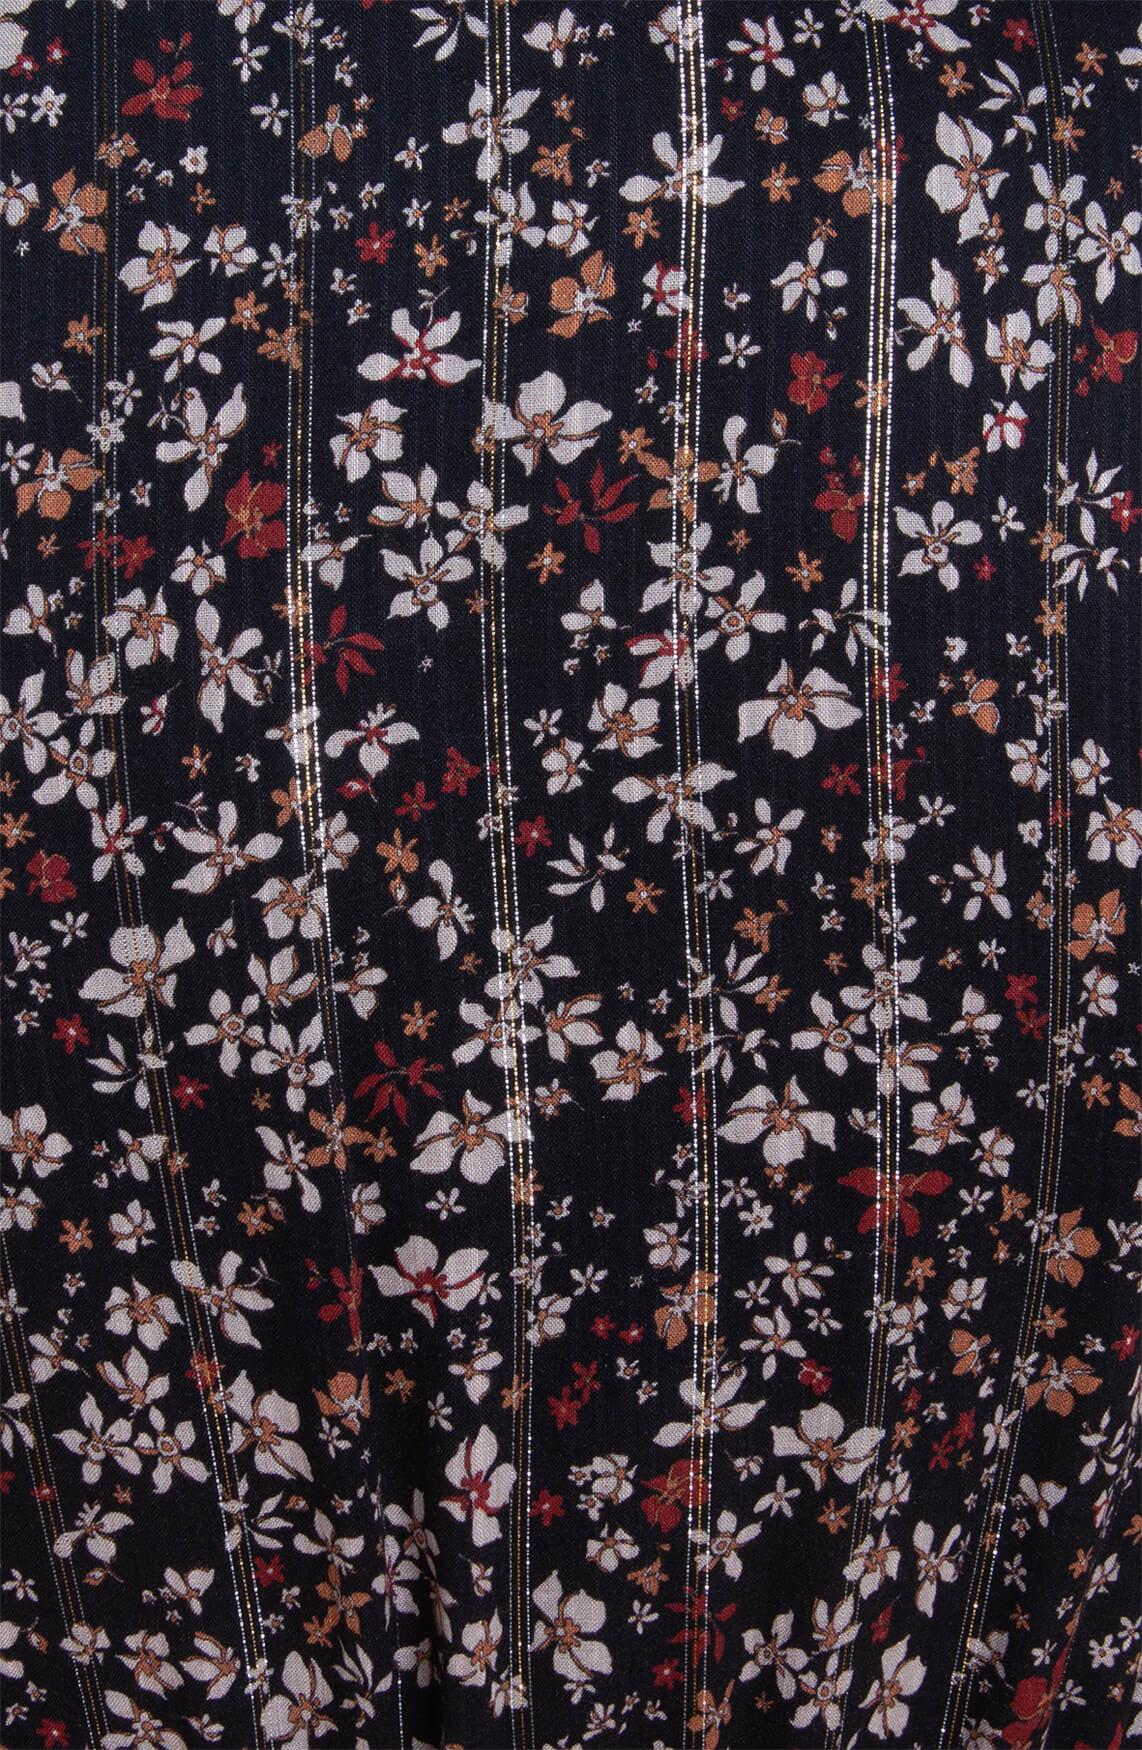 La Fée Maraboutée Dames Jurk met bloemenprint zwart